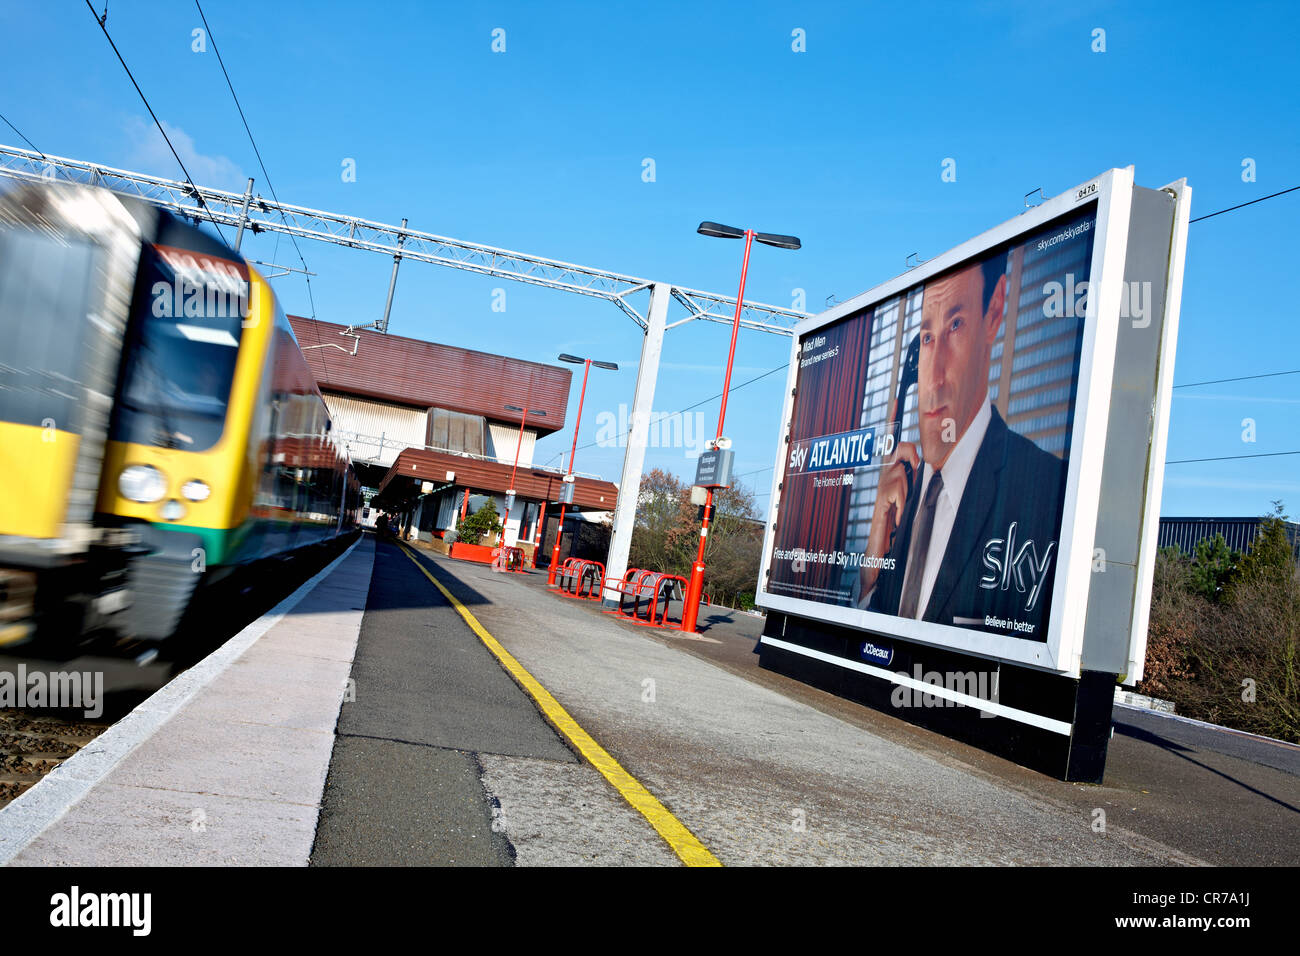 Outdoor advertising billboard panel at Birmingham International railway station. Creative shows ad for Sky HD Atlantic - Stock Image